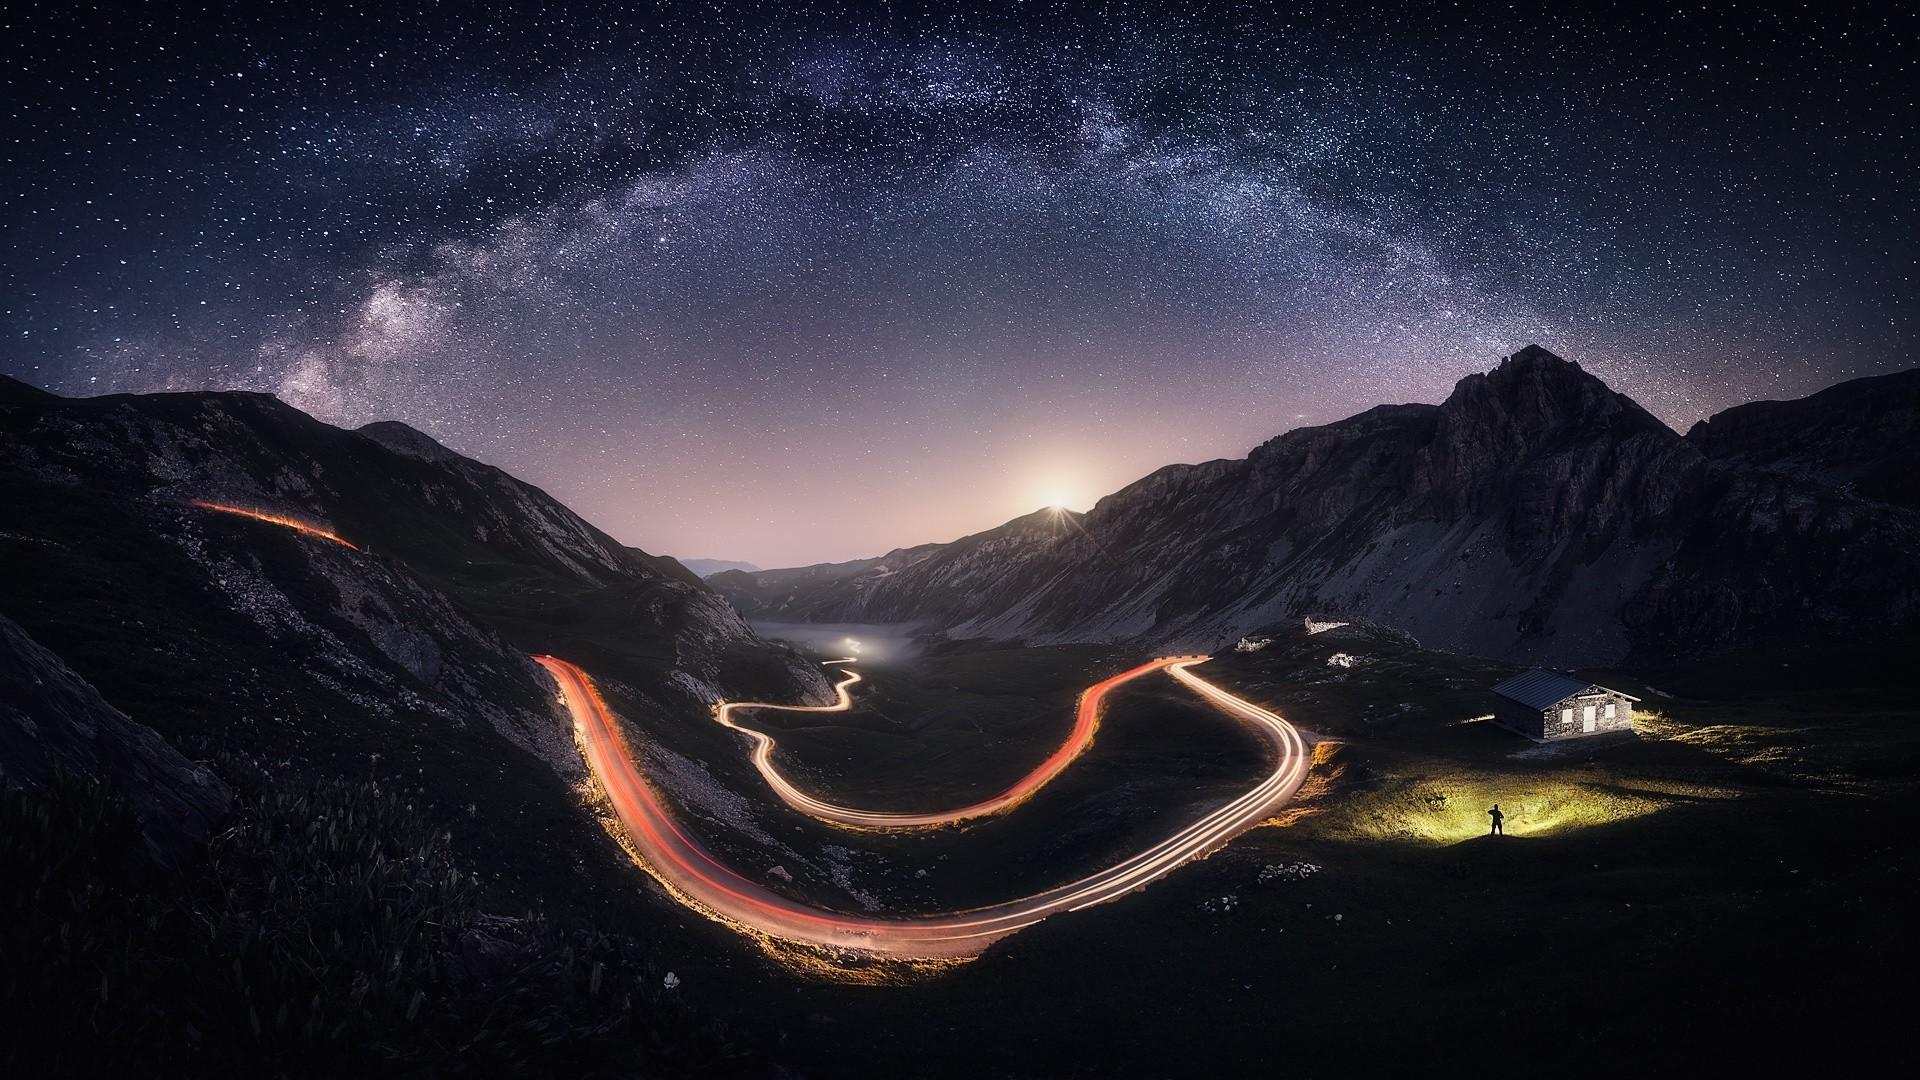 HD Milky Way Wallpapers – WallpaperSafari